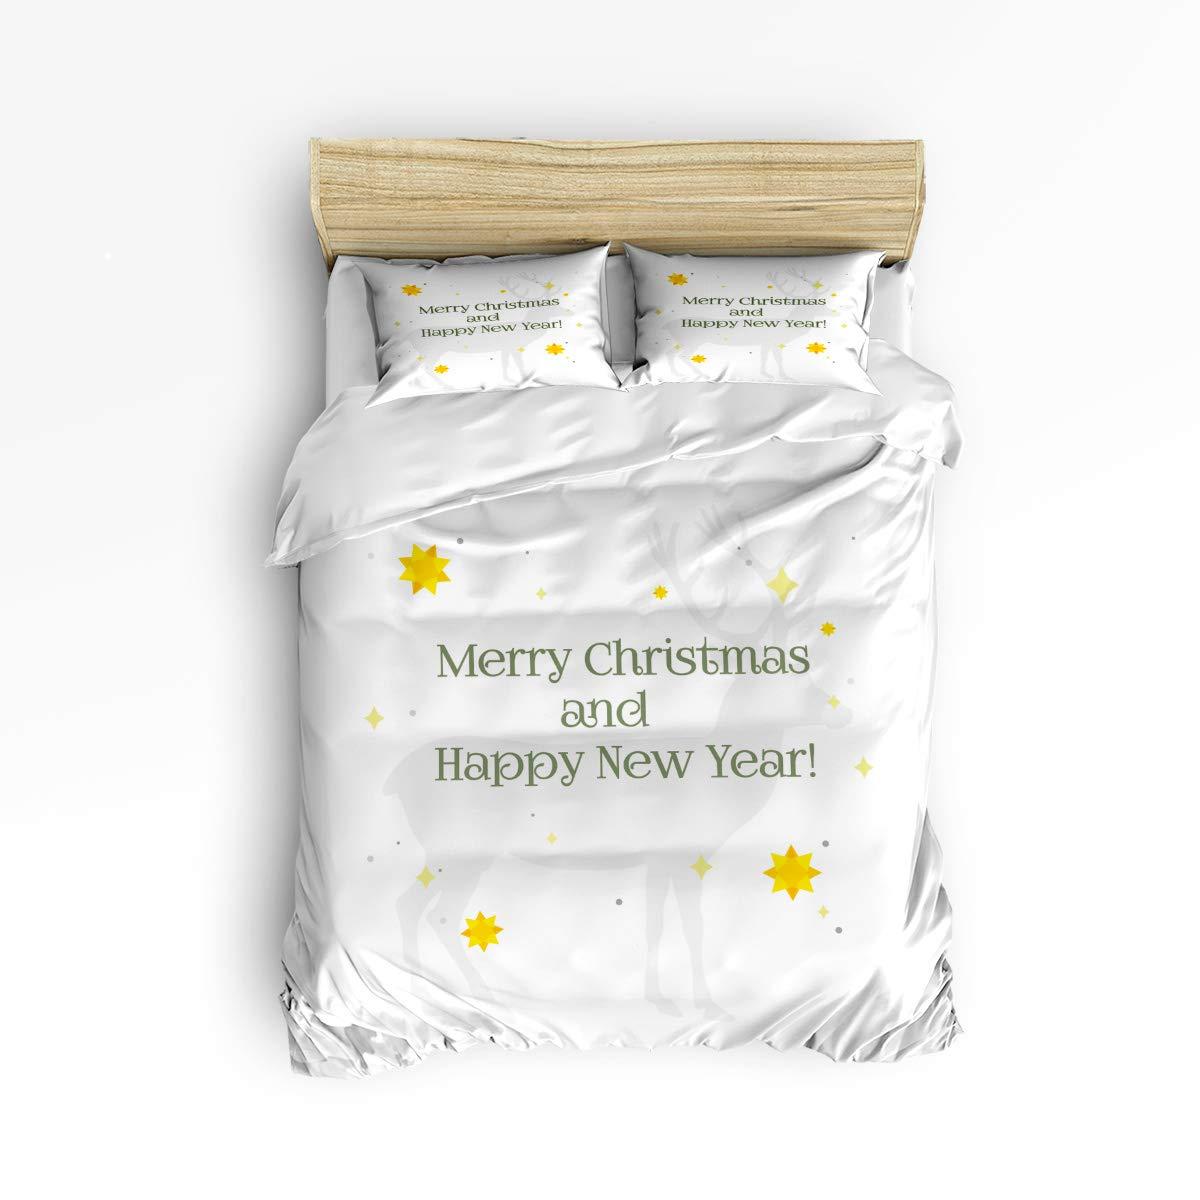 YEHO アートギャラリー ラブリー ベッドシーツセット 布団カバーセット 子供 大人用 手塗り シカ 鹿 動物 パターン ソフト 快適 寝具セット バスルーム ホームデコレーション King Size 2018126WHLYAGSJTSJTSLSZ00030SJTDYAG B07L5TC5V9 Merry Christmas27yag7655 King Size